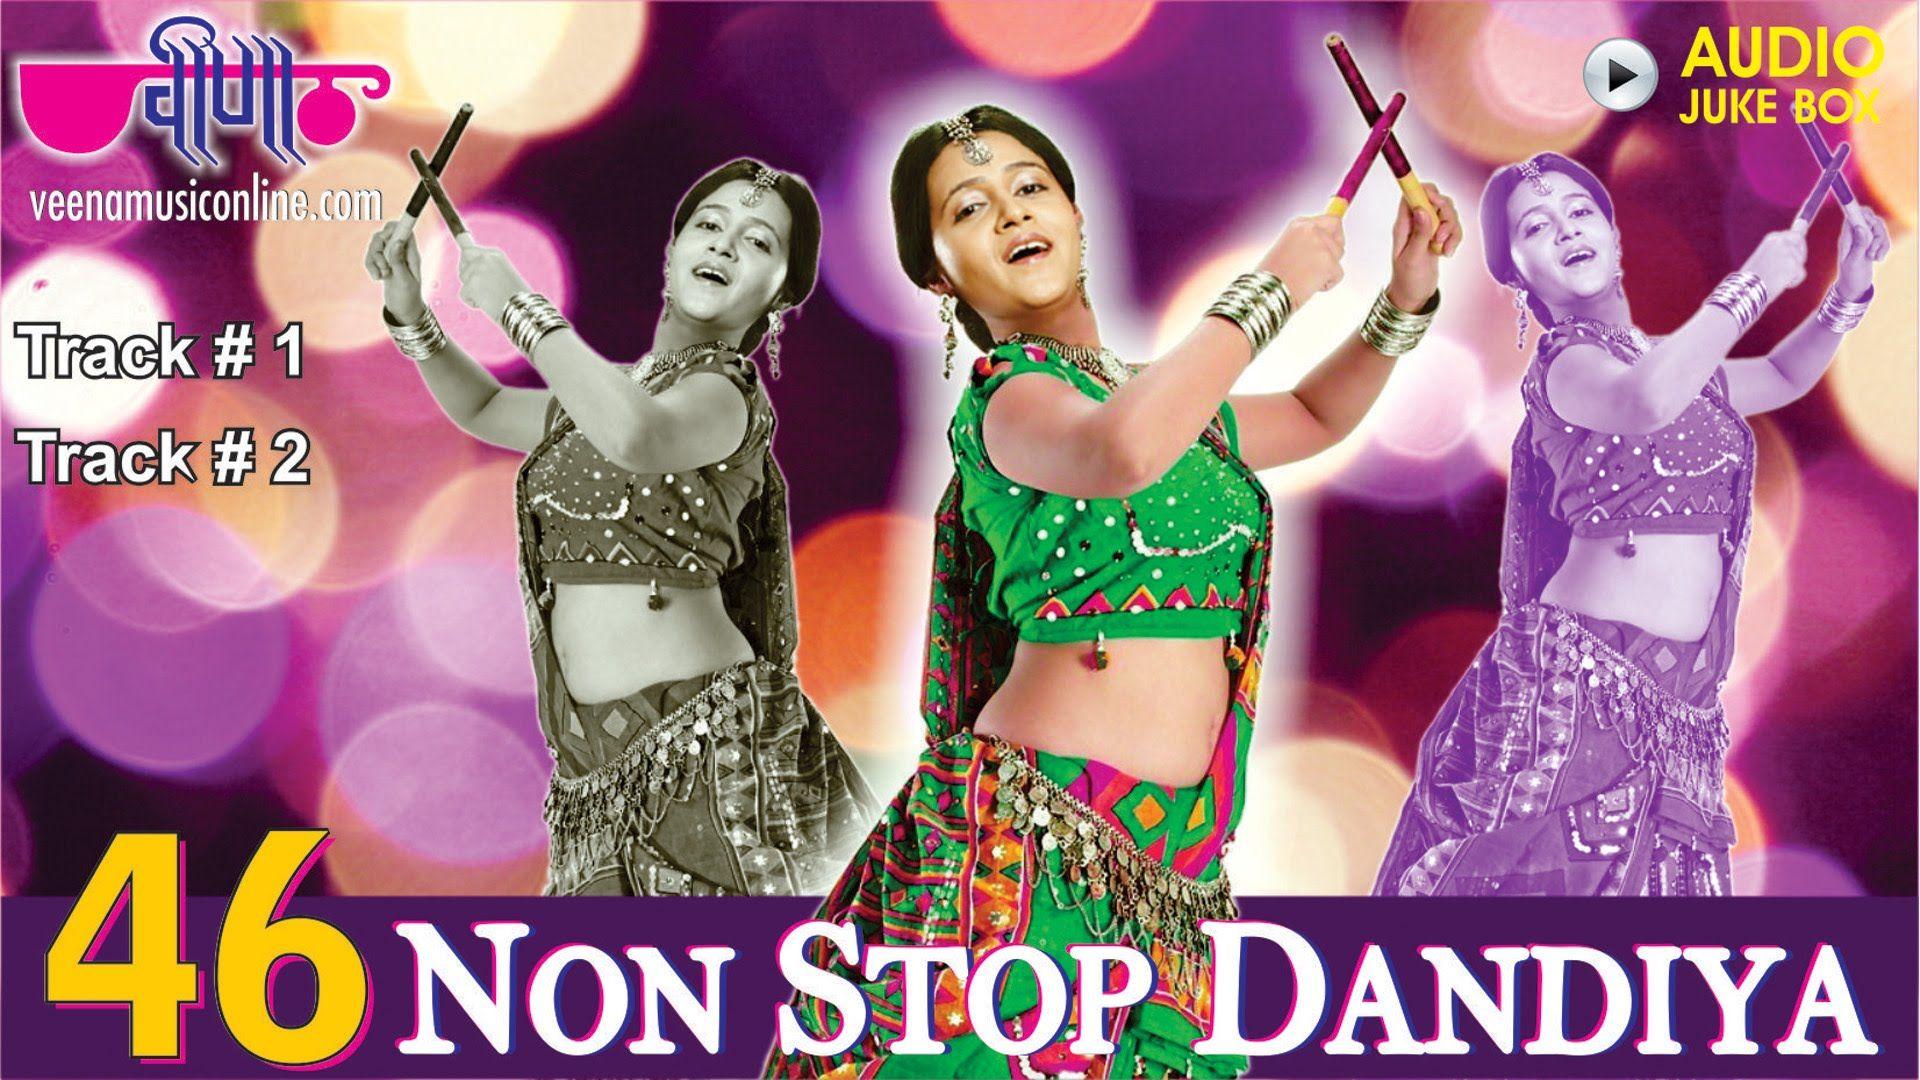 46 Superhit Non Stop Dandiya Dance Songs Audio Jukebox New Navratri Garba Dance Songs 2015 Garba Dance Navratri Songs Garba Songs